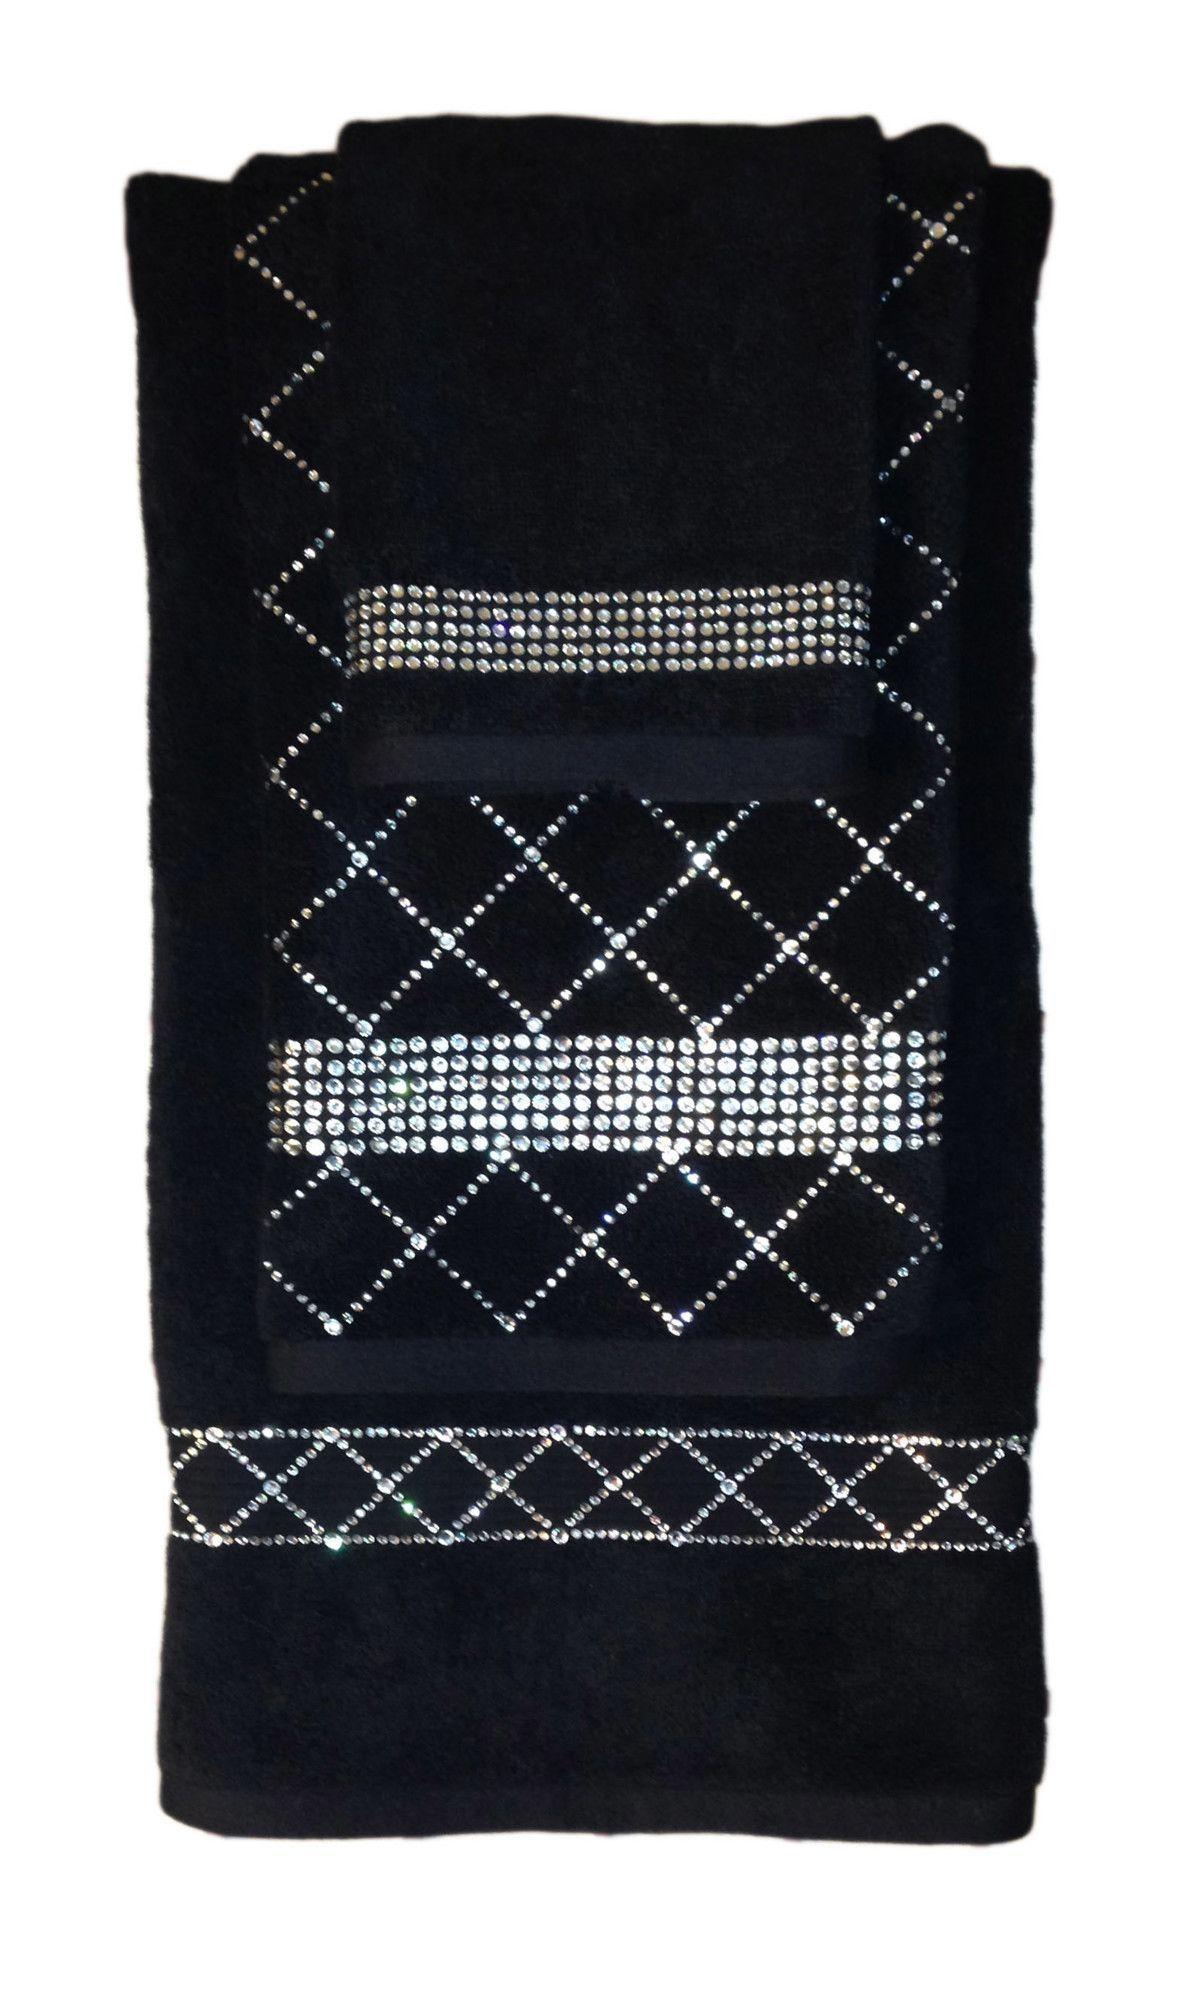 Sparkles Home Rhinestone 3 Piece Towel Set with Stripe Design